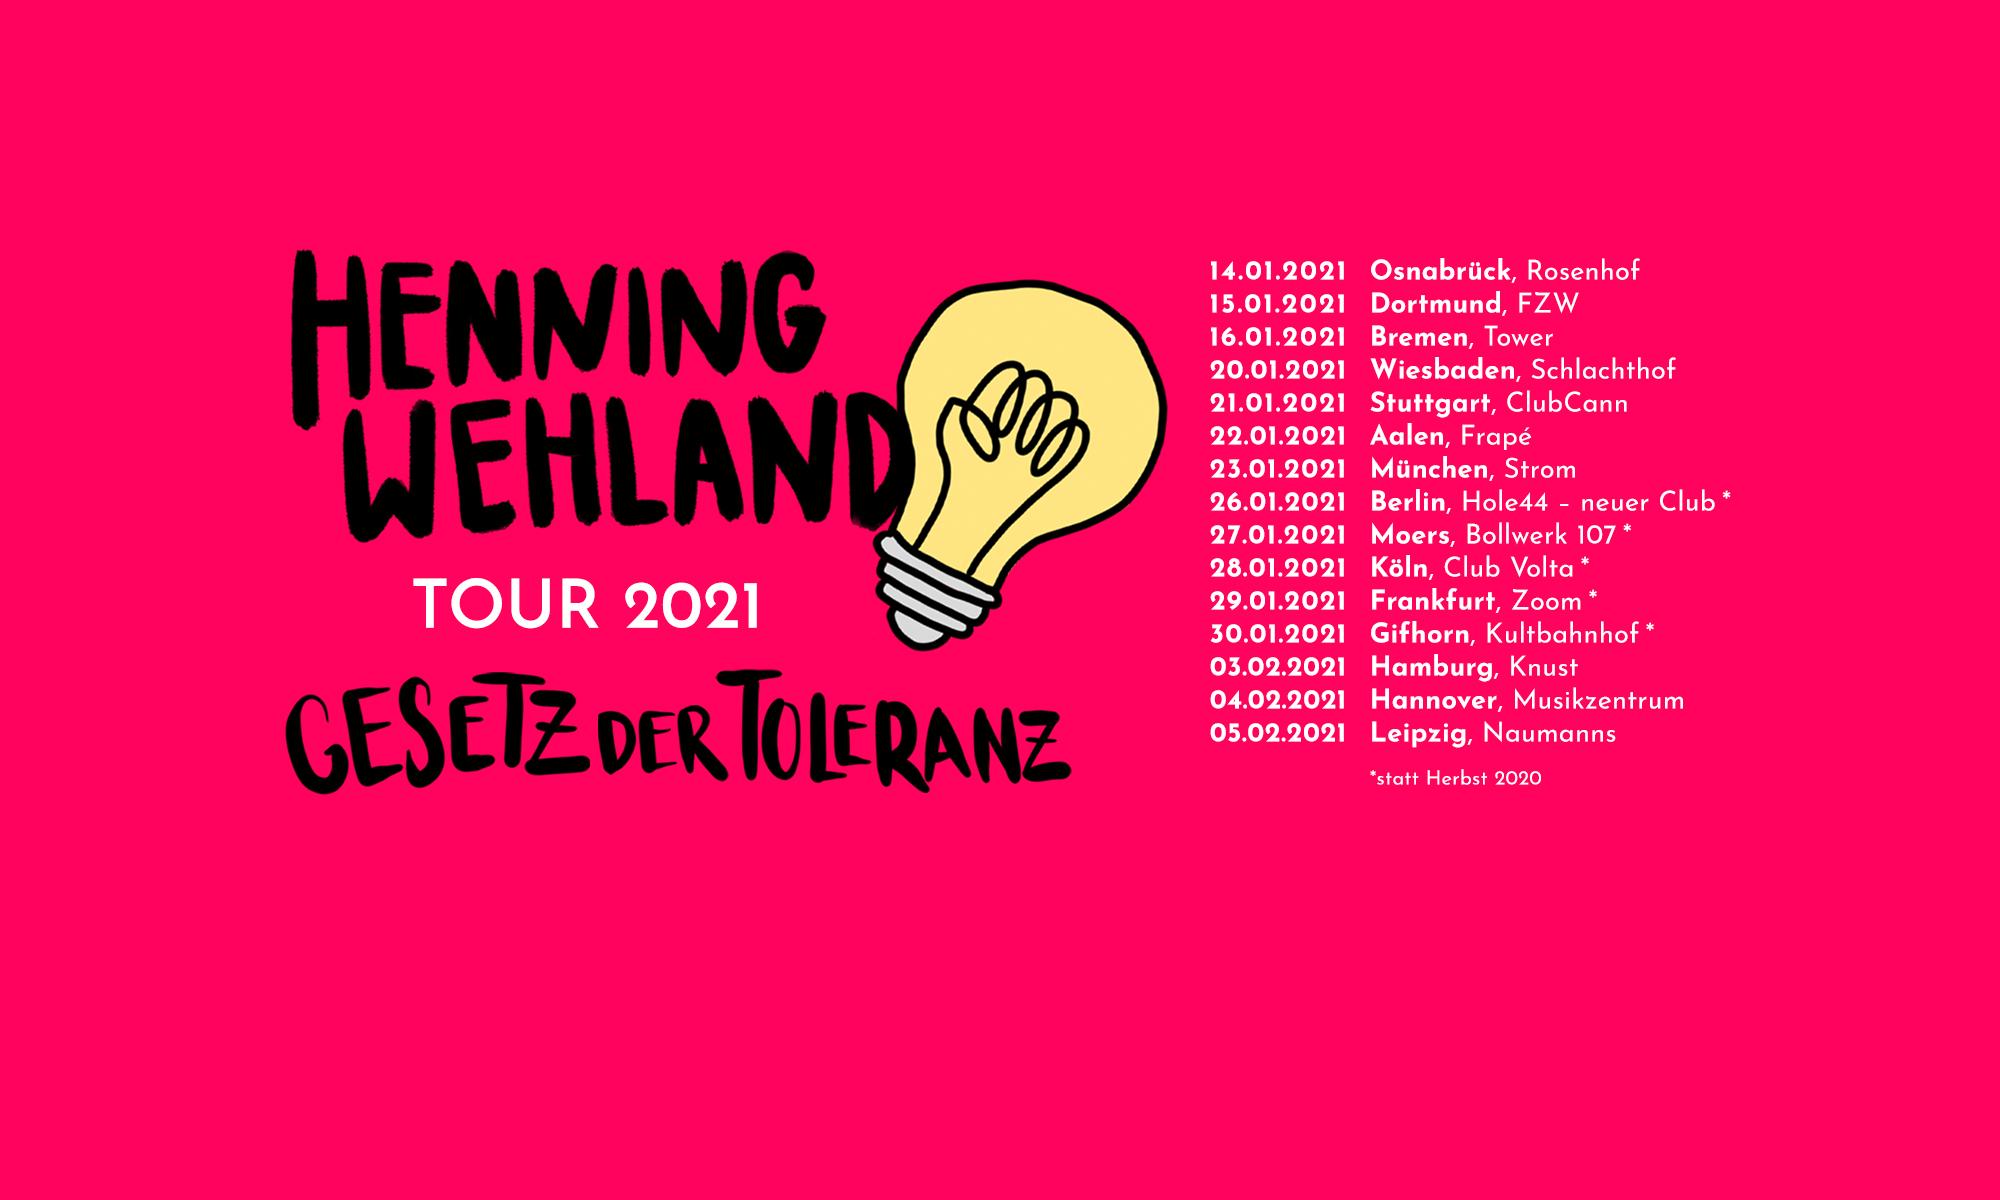 Henning Wehland